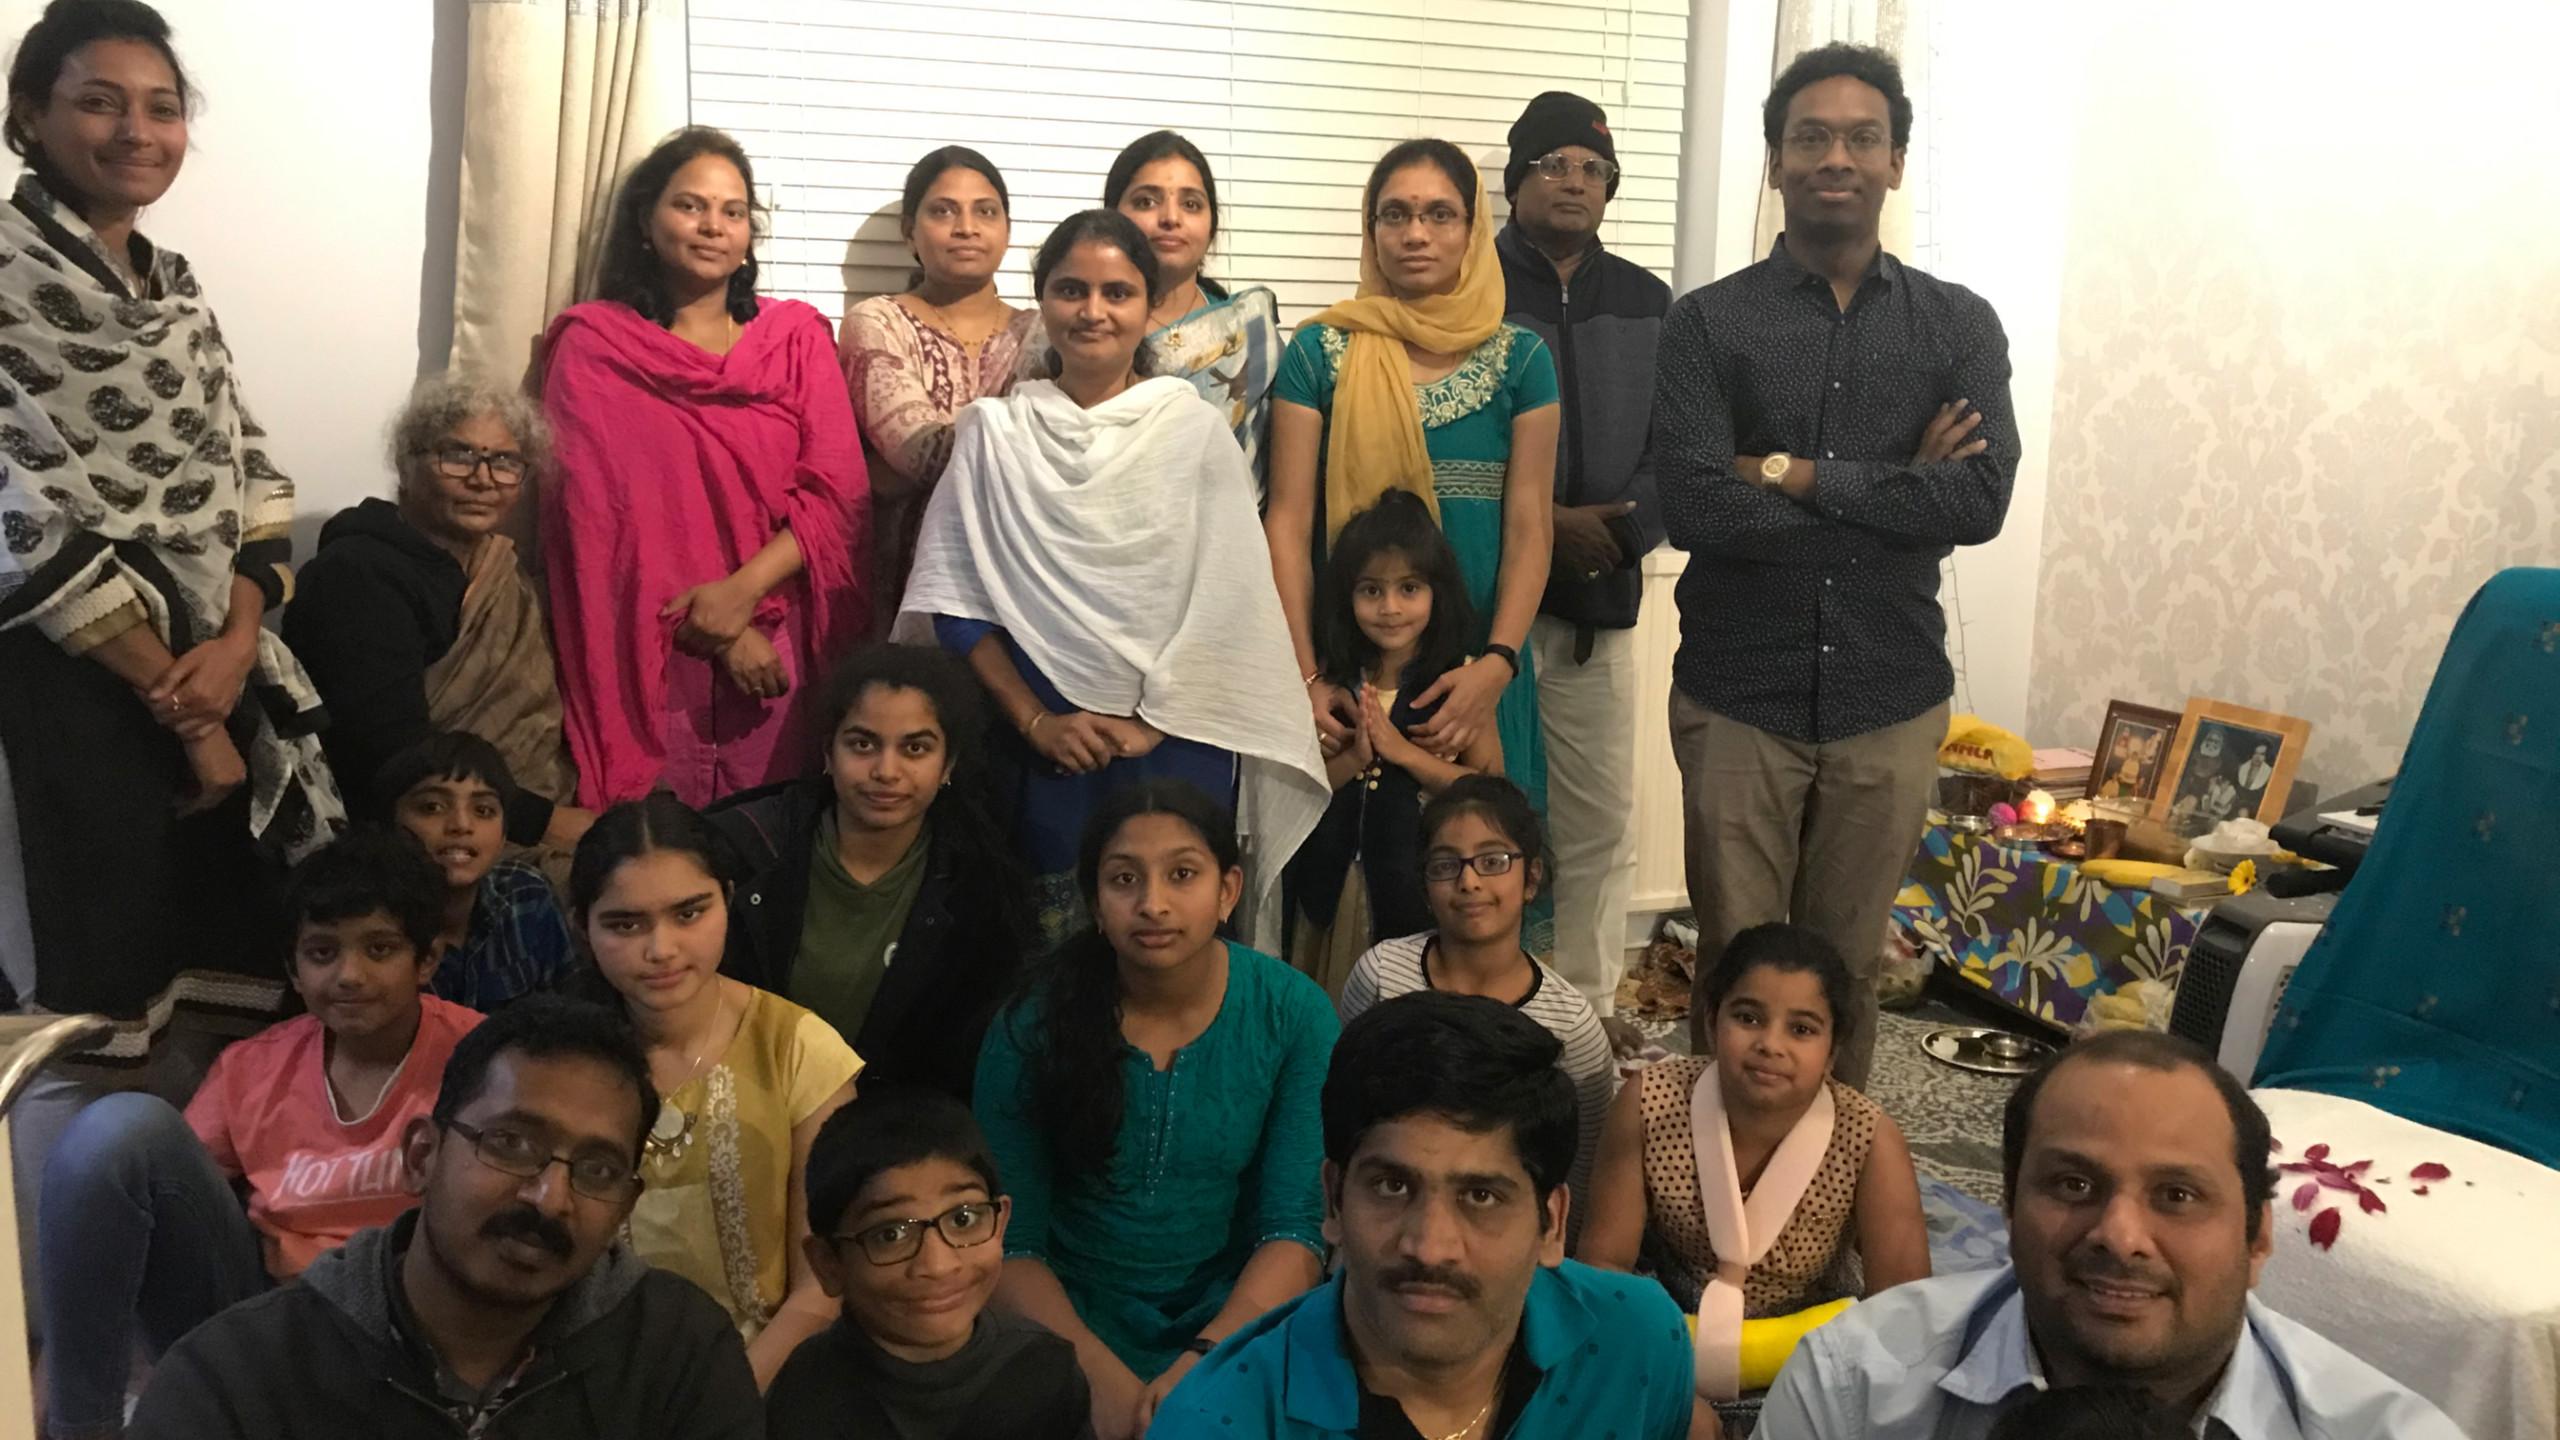 London Aaradhana at Mr.Krishna Kishore Yerra's house on 5th Oct 2019